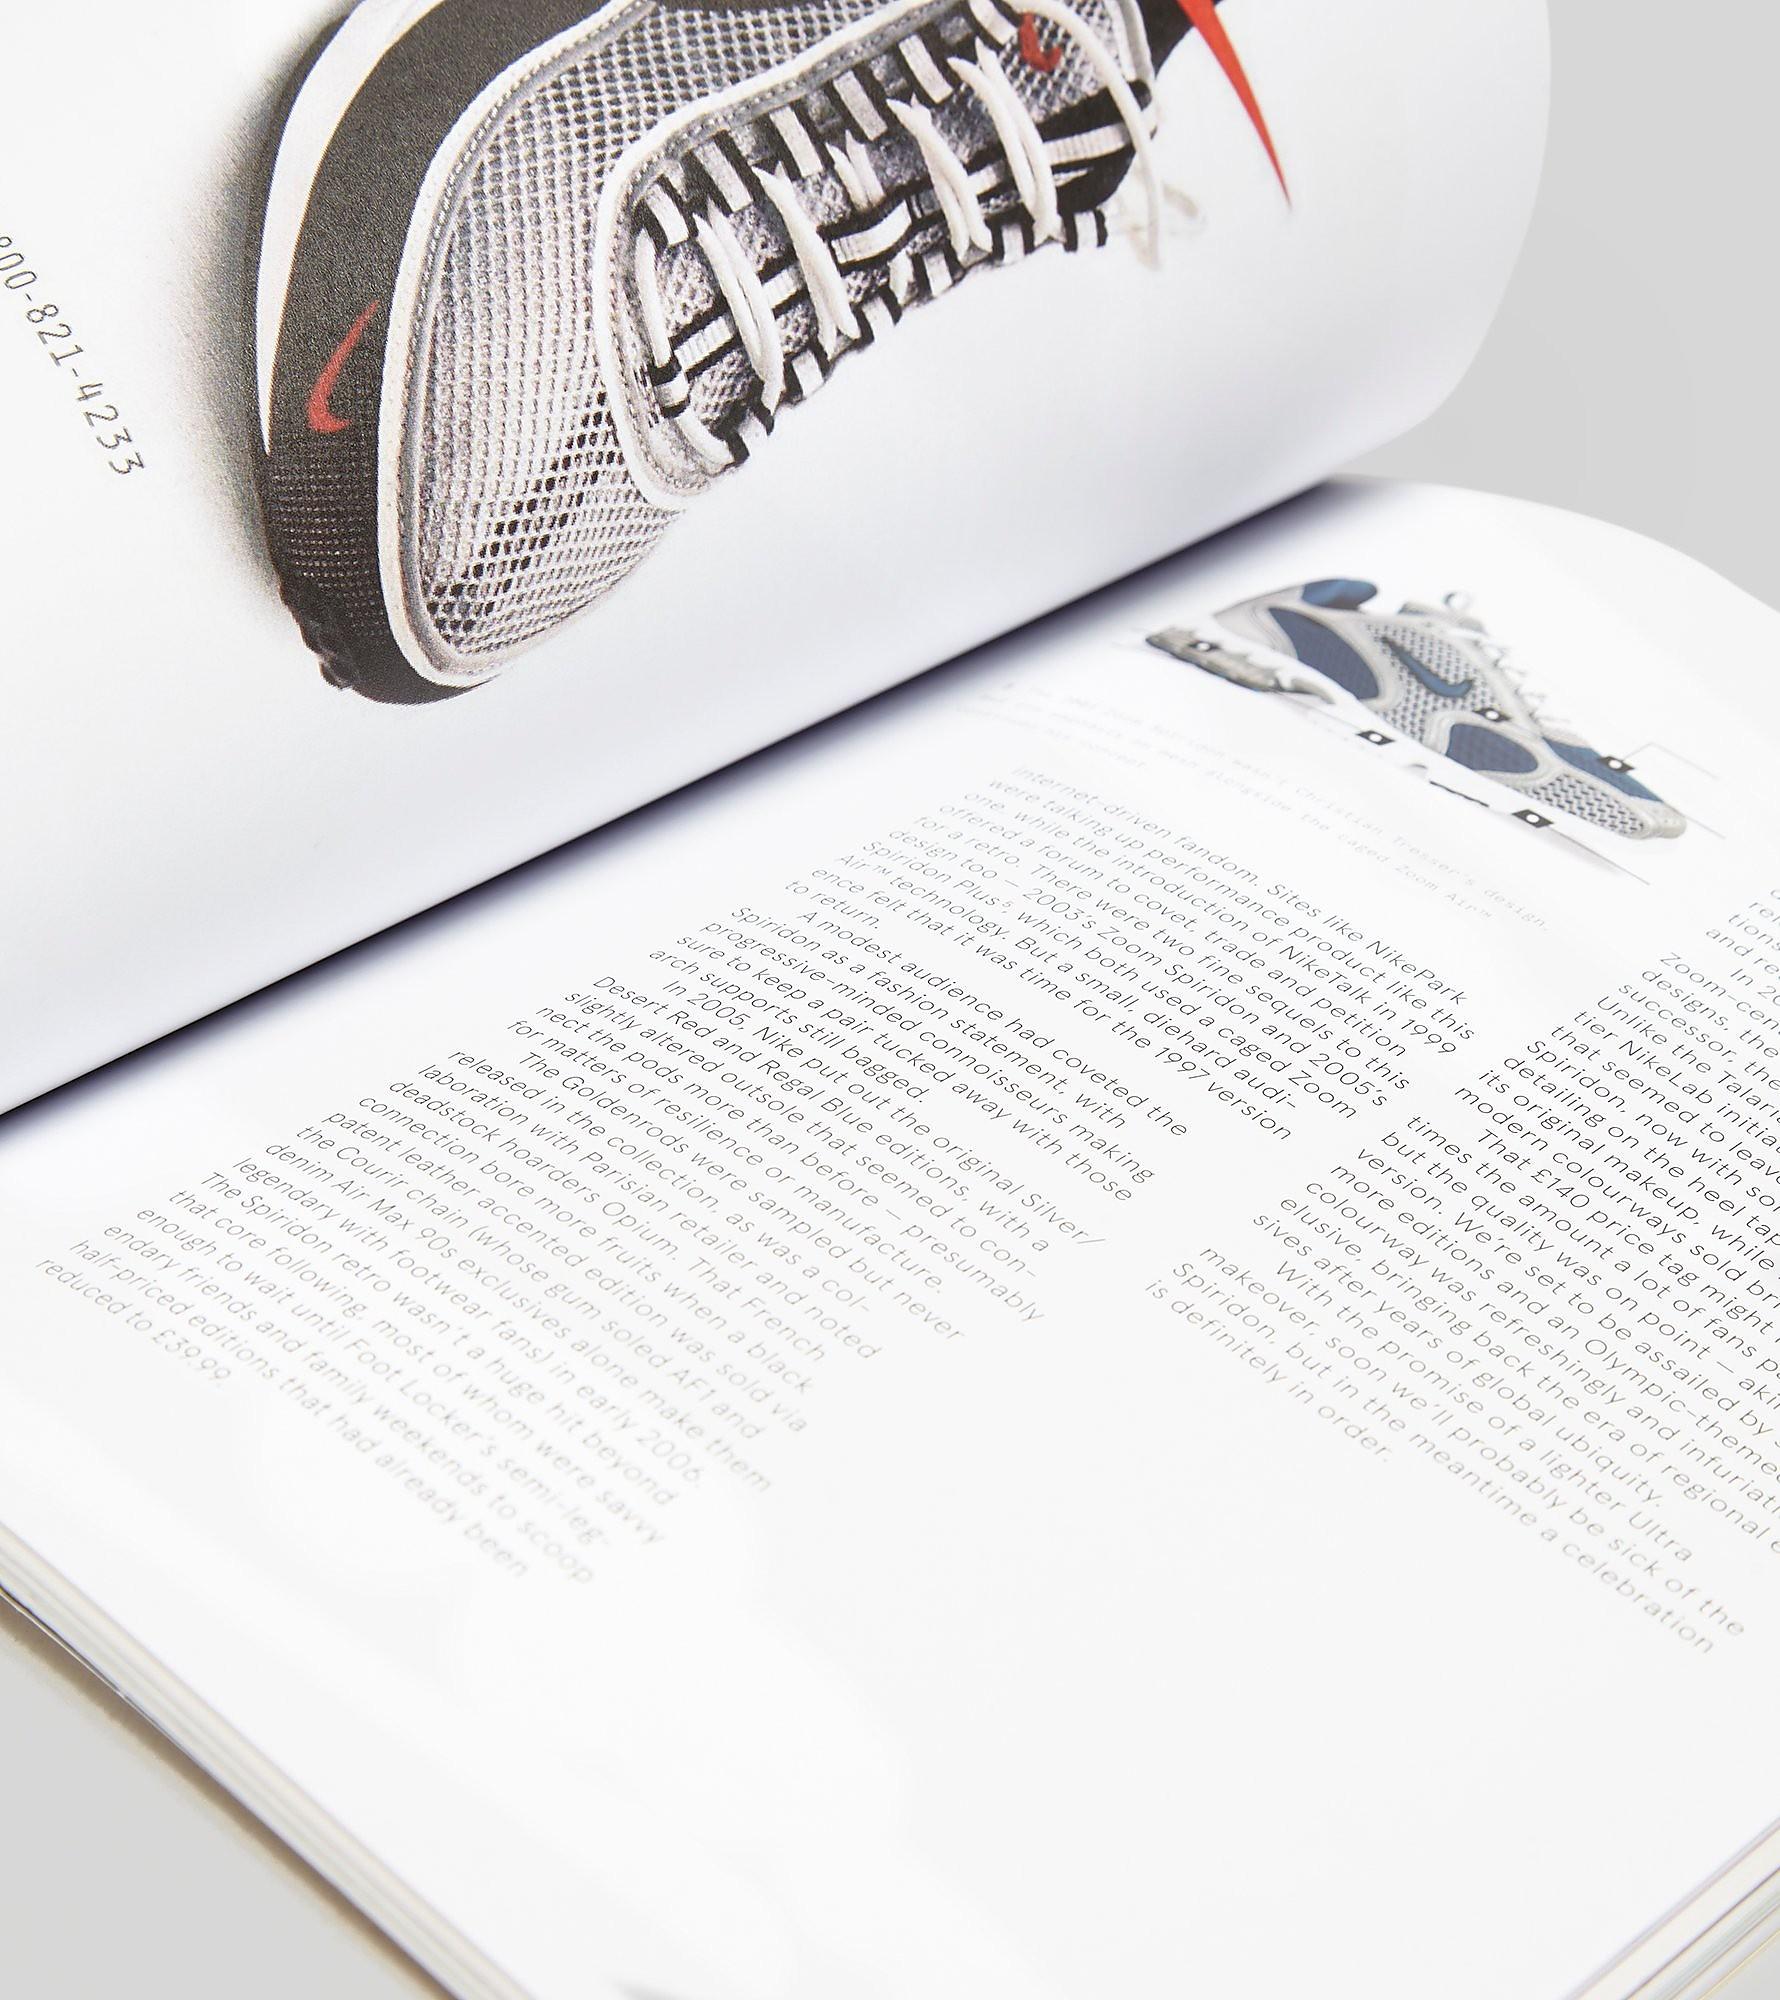 Crepe City Magazine Vol. 3